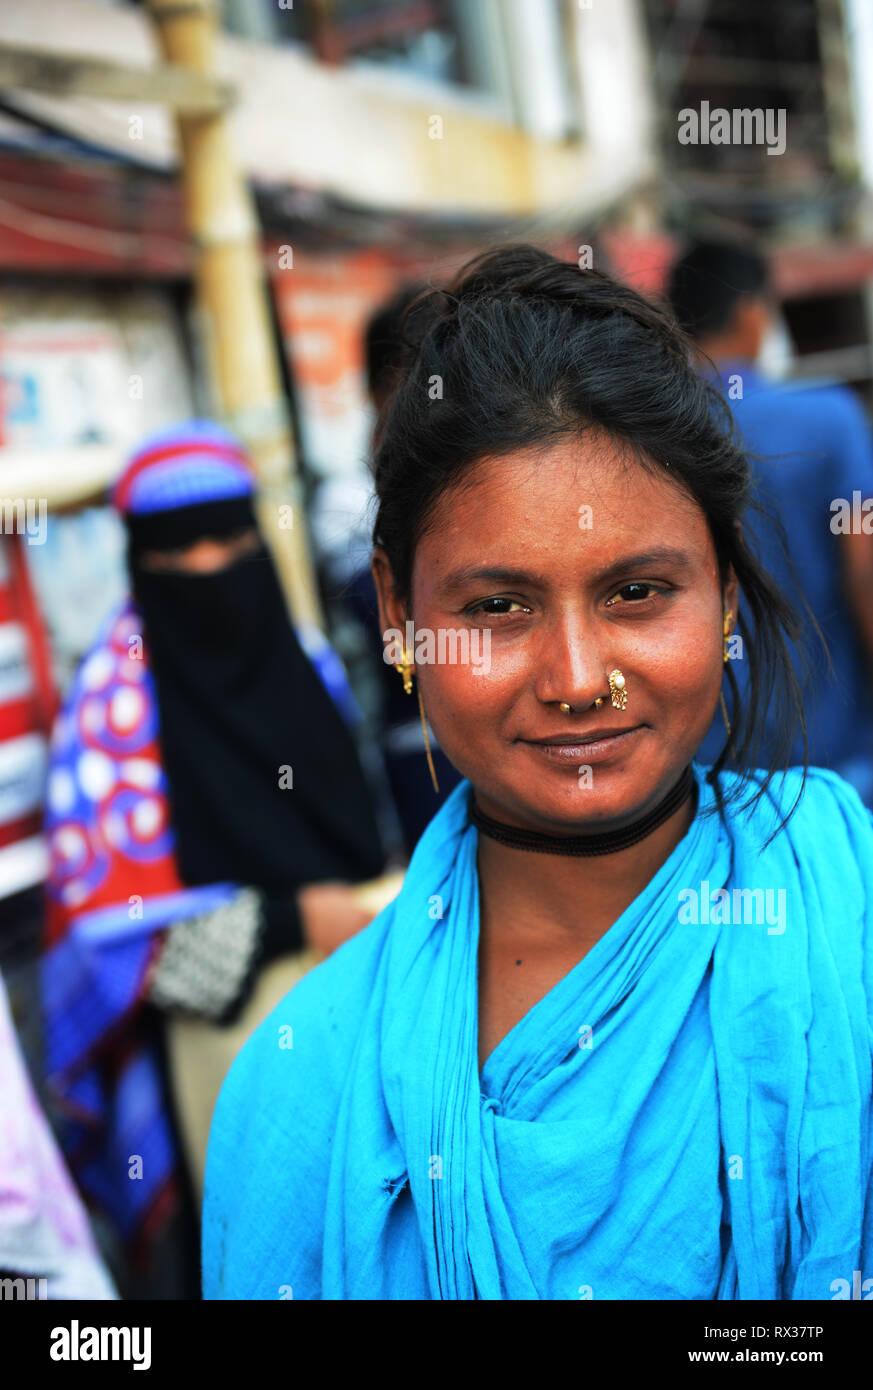 A smiling Bangladeshi woman in Dhaka. - Stock Image